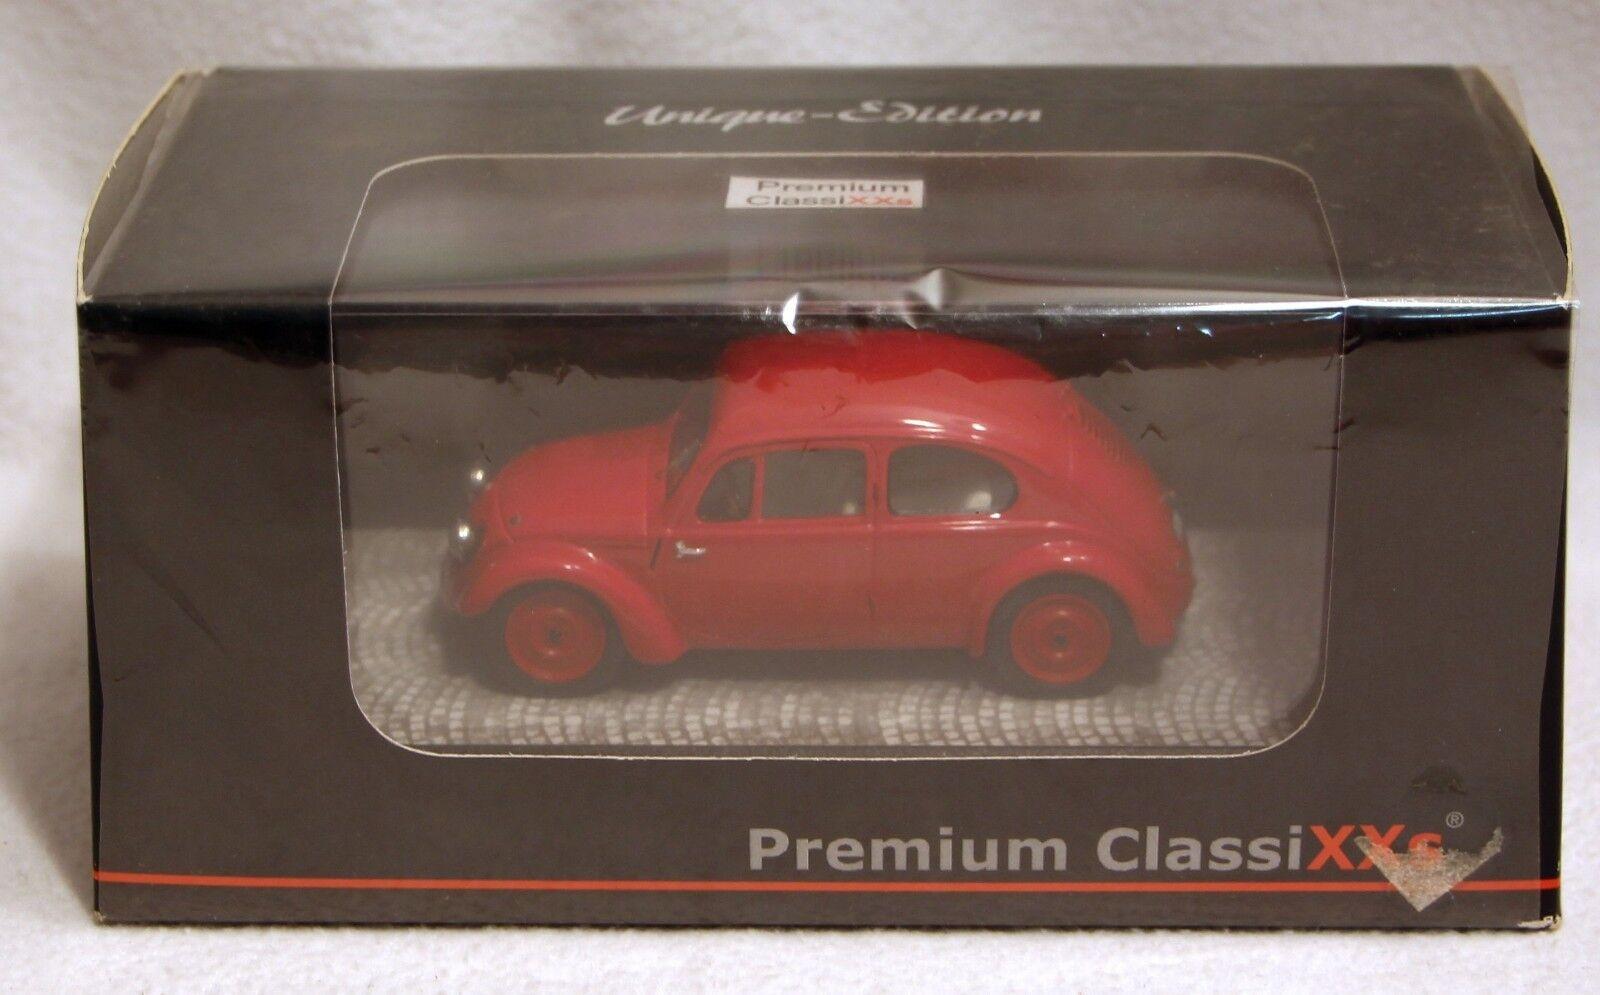 Premium Classixxs 1:43 métal modèle -18025 tentative tentative tentative voiture v3 prototype limitée 618aa4